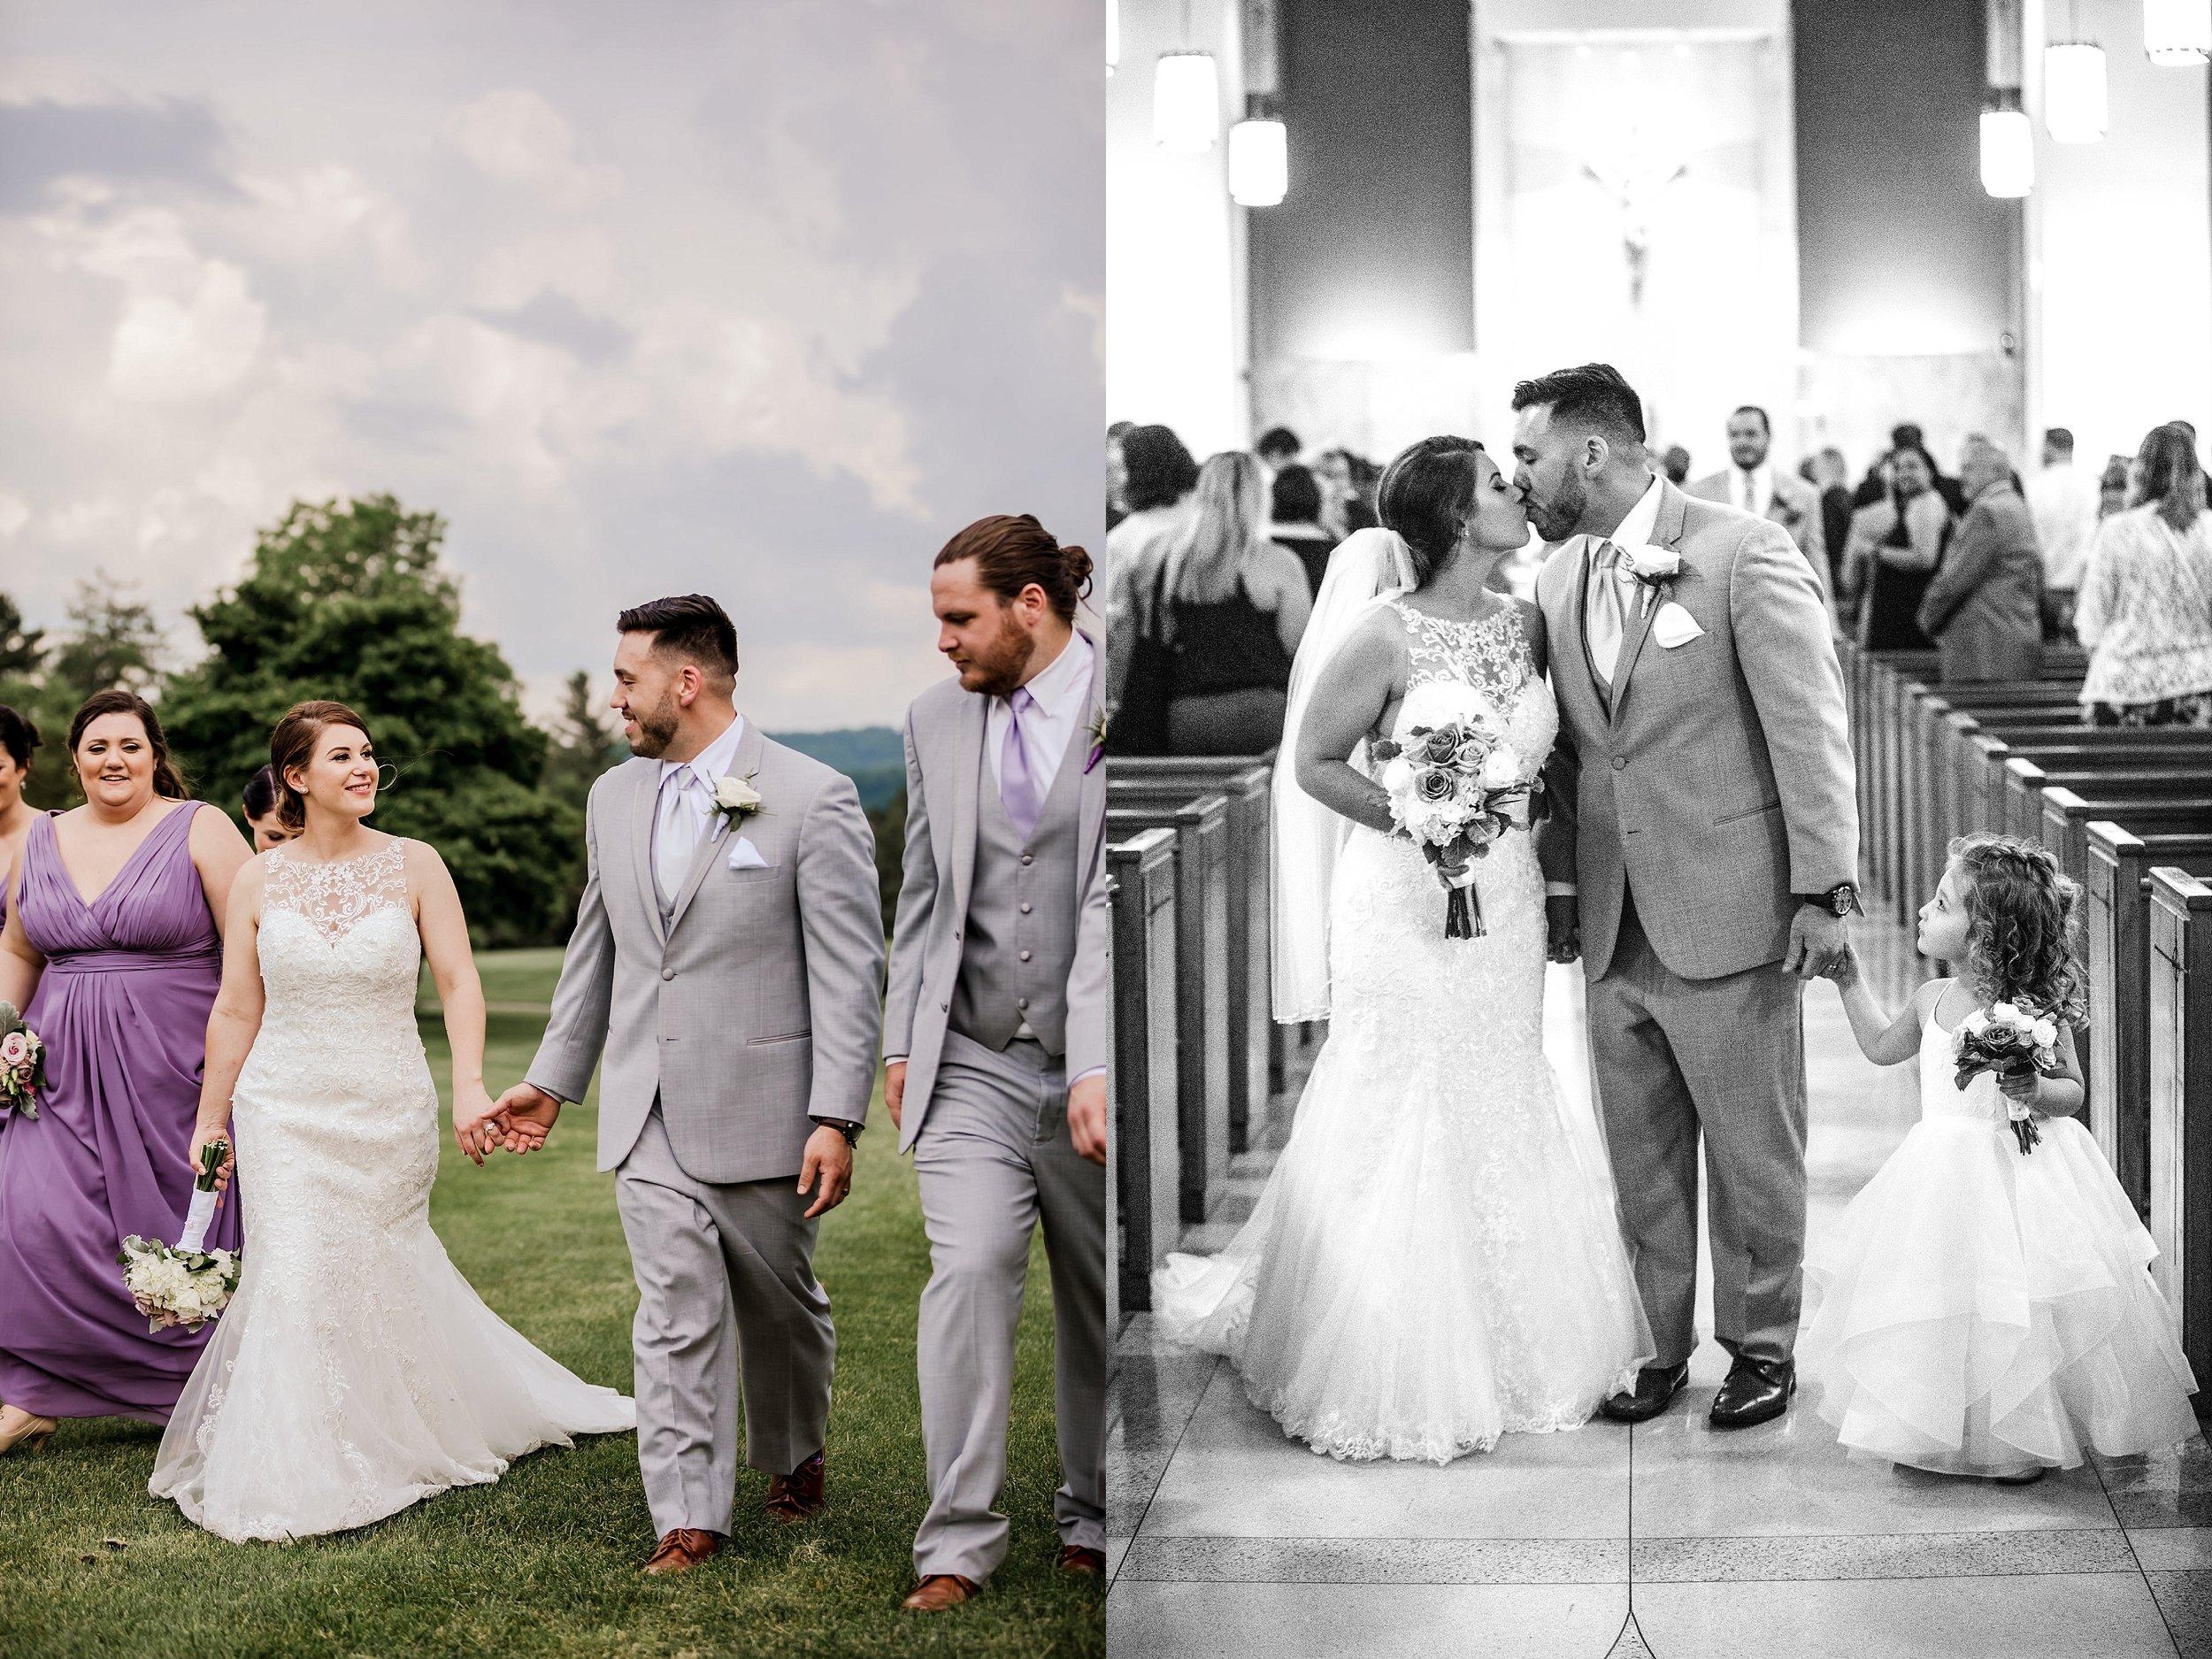 Brookside-Country-Club-Wedding-Photographer_0004.jpg